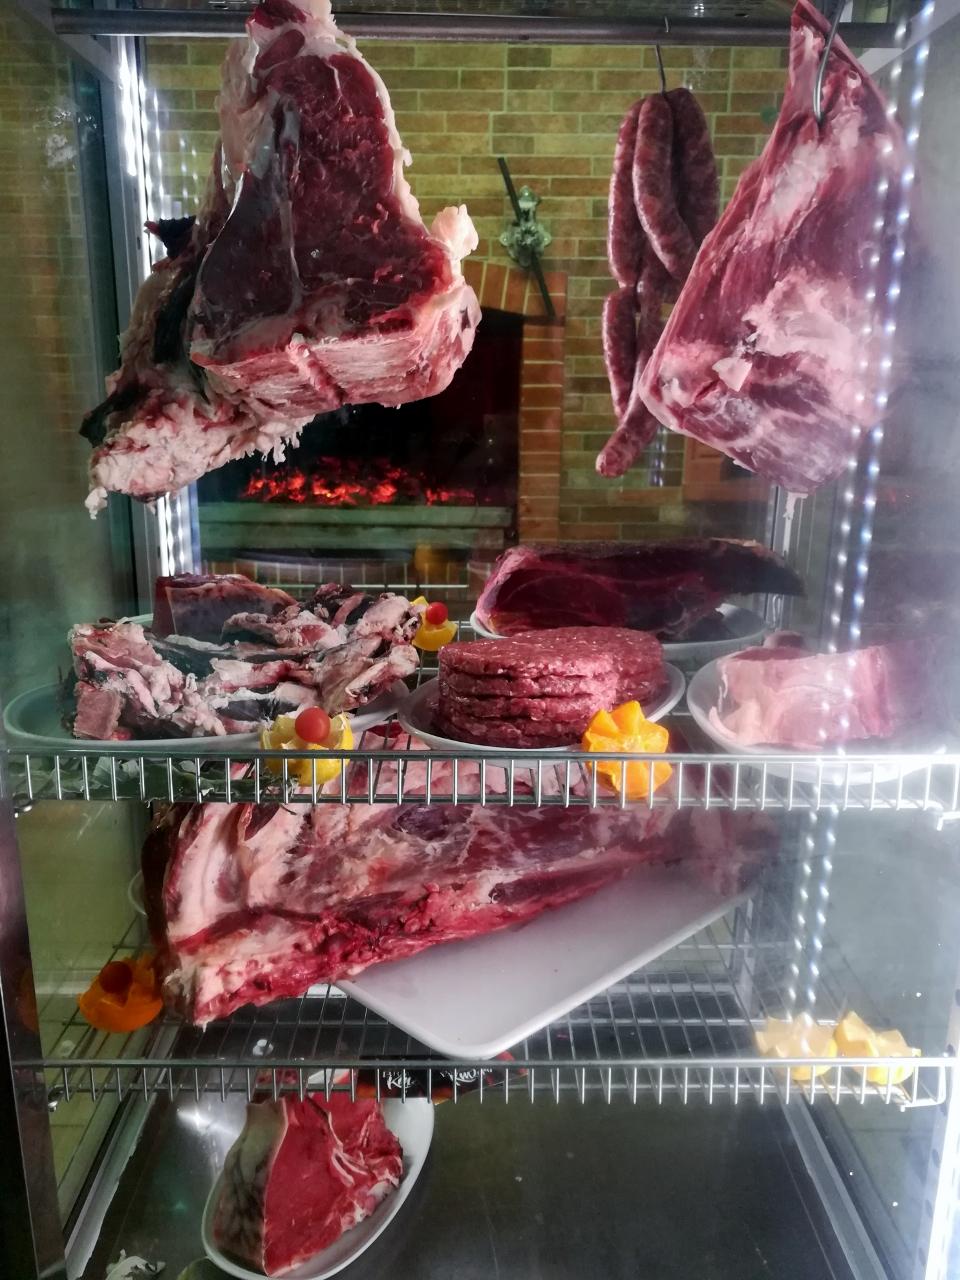 Braceria KmZero - Le Carni a Km0